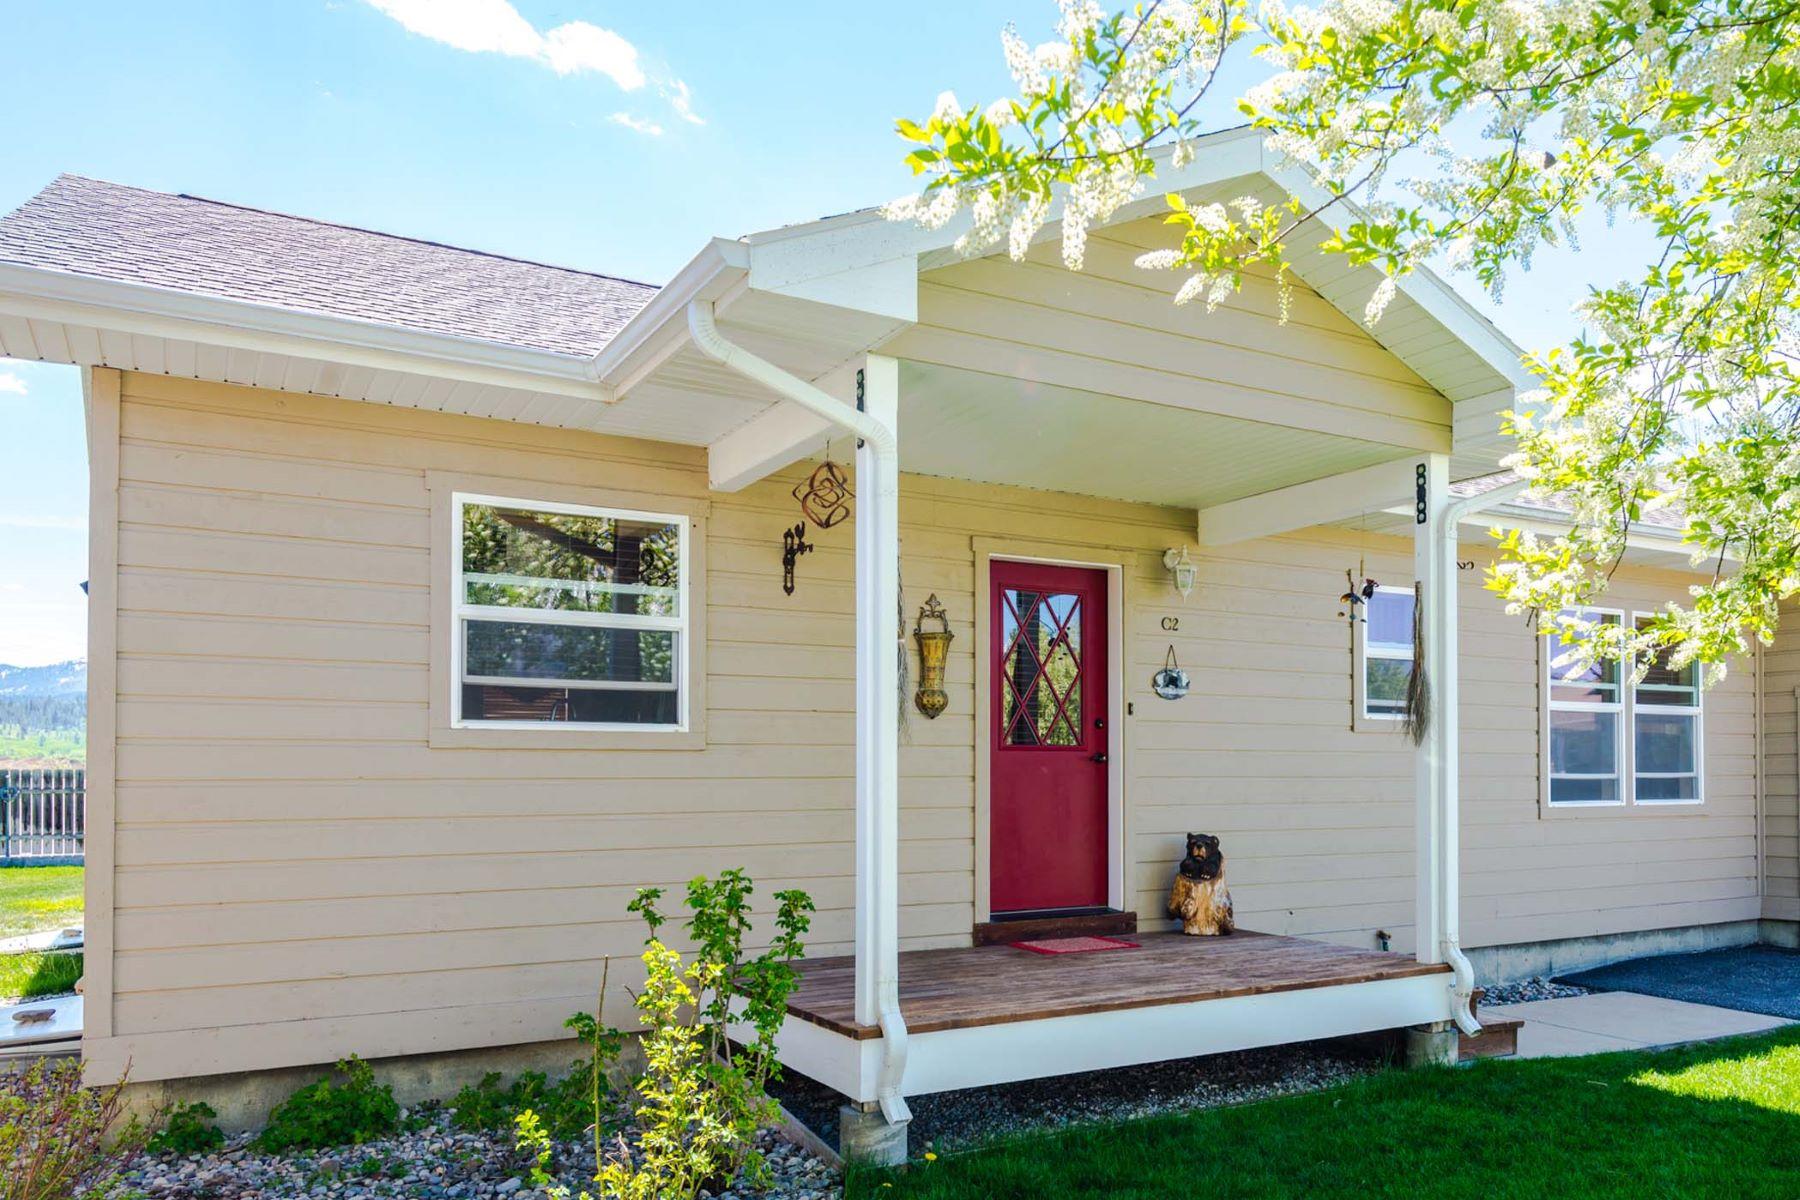 Moradia para Venda às Remodeled Four Bedroom Townhome 504 Snake River Drive, Unit C2 Alpine, Wyoming, 83128 Jackson Hole, Estados Unidos